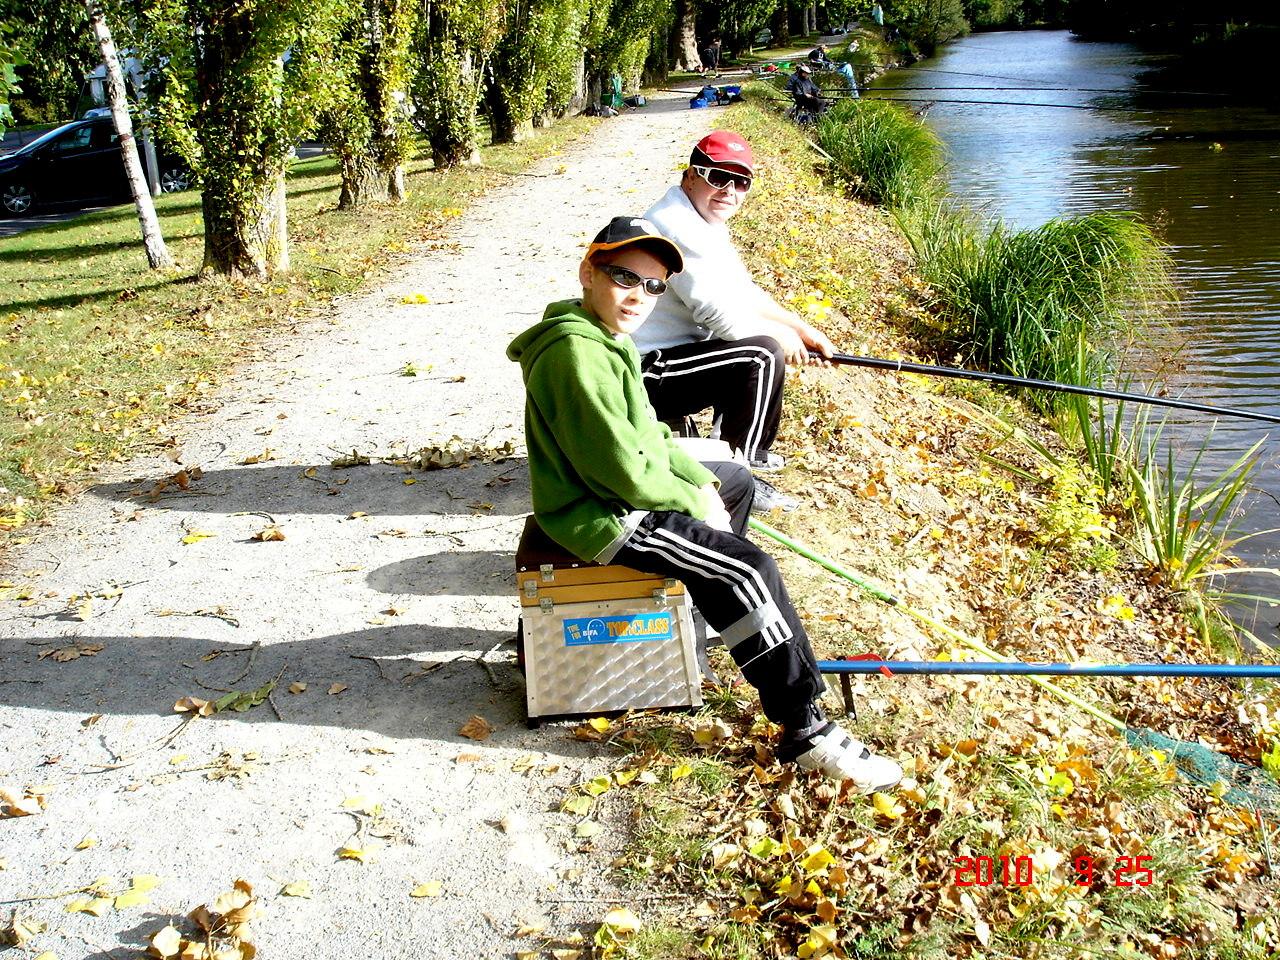 Marathon de Pêche 2010